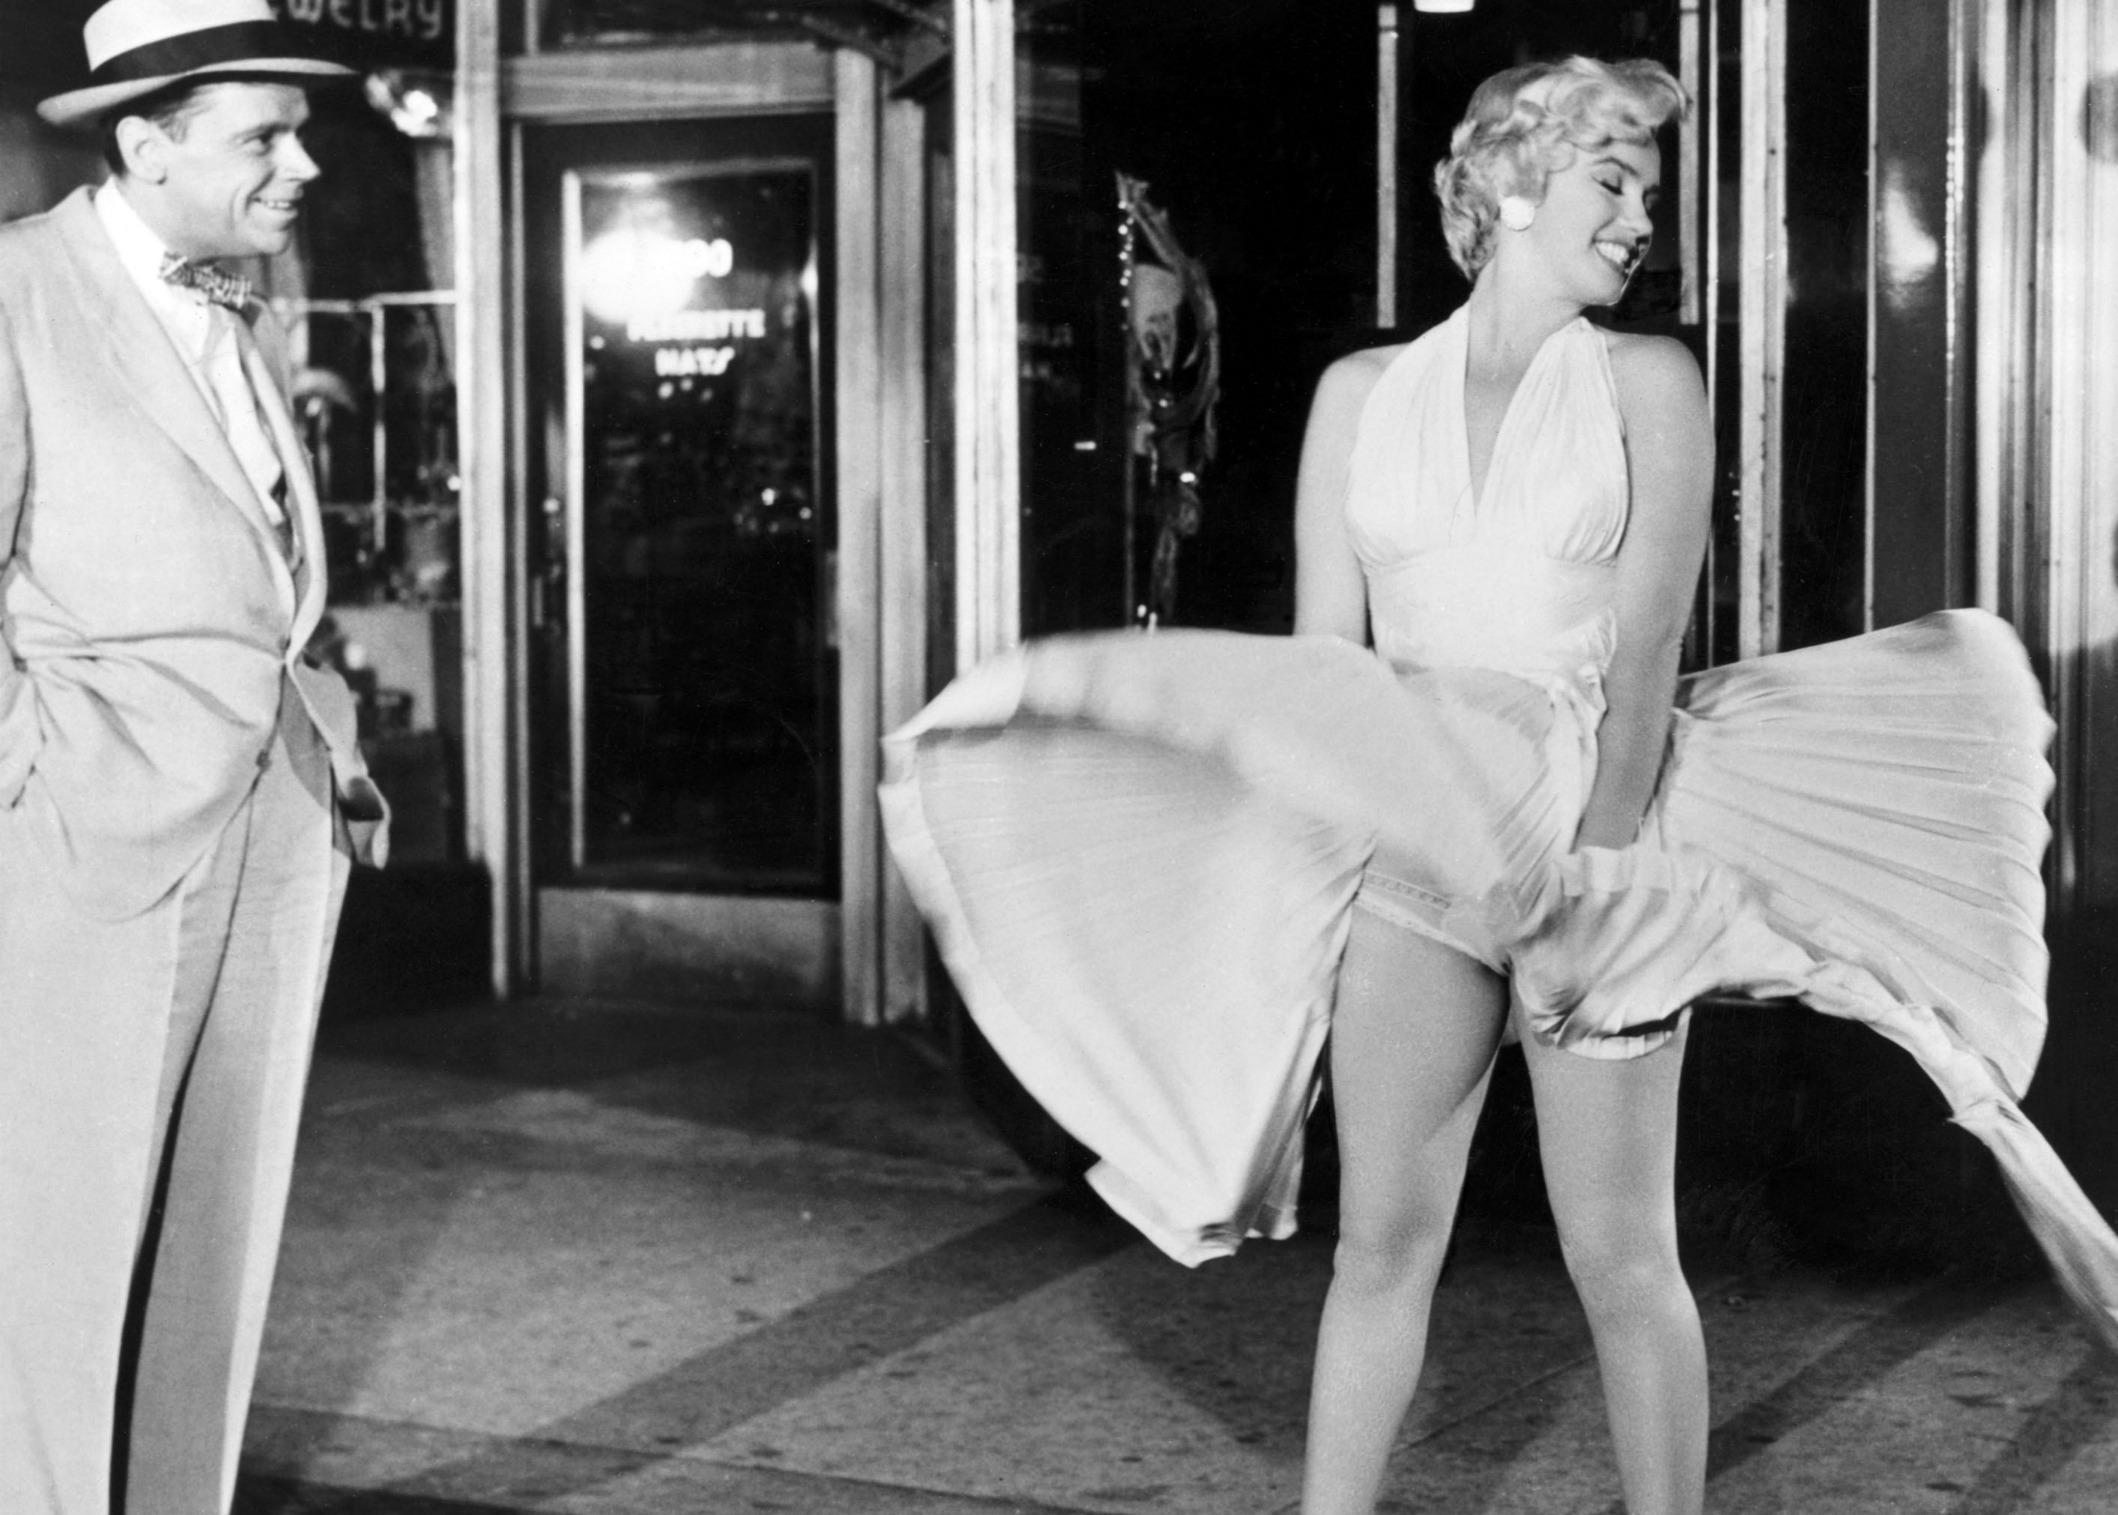 Berühmtheiten Marilyn Monroe Wallpaper Hd Wallpaper 1920x1080 Rare